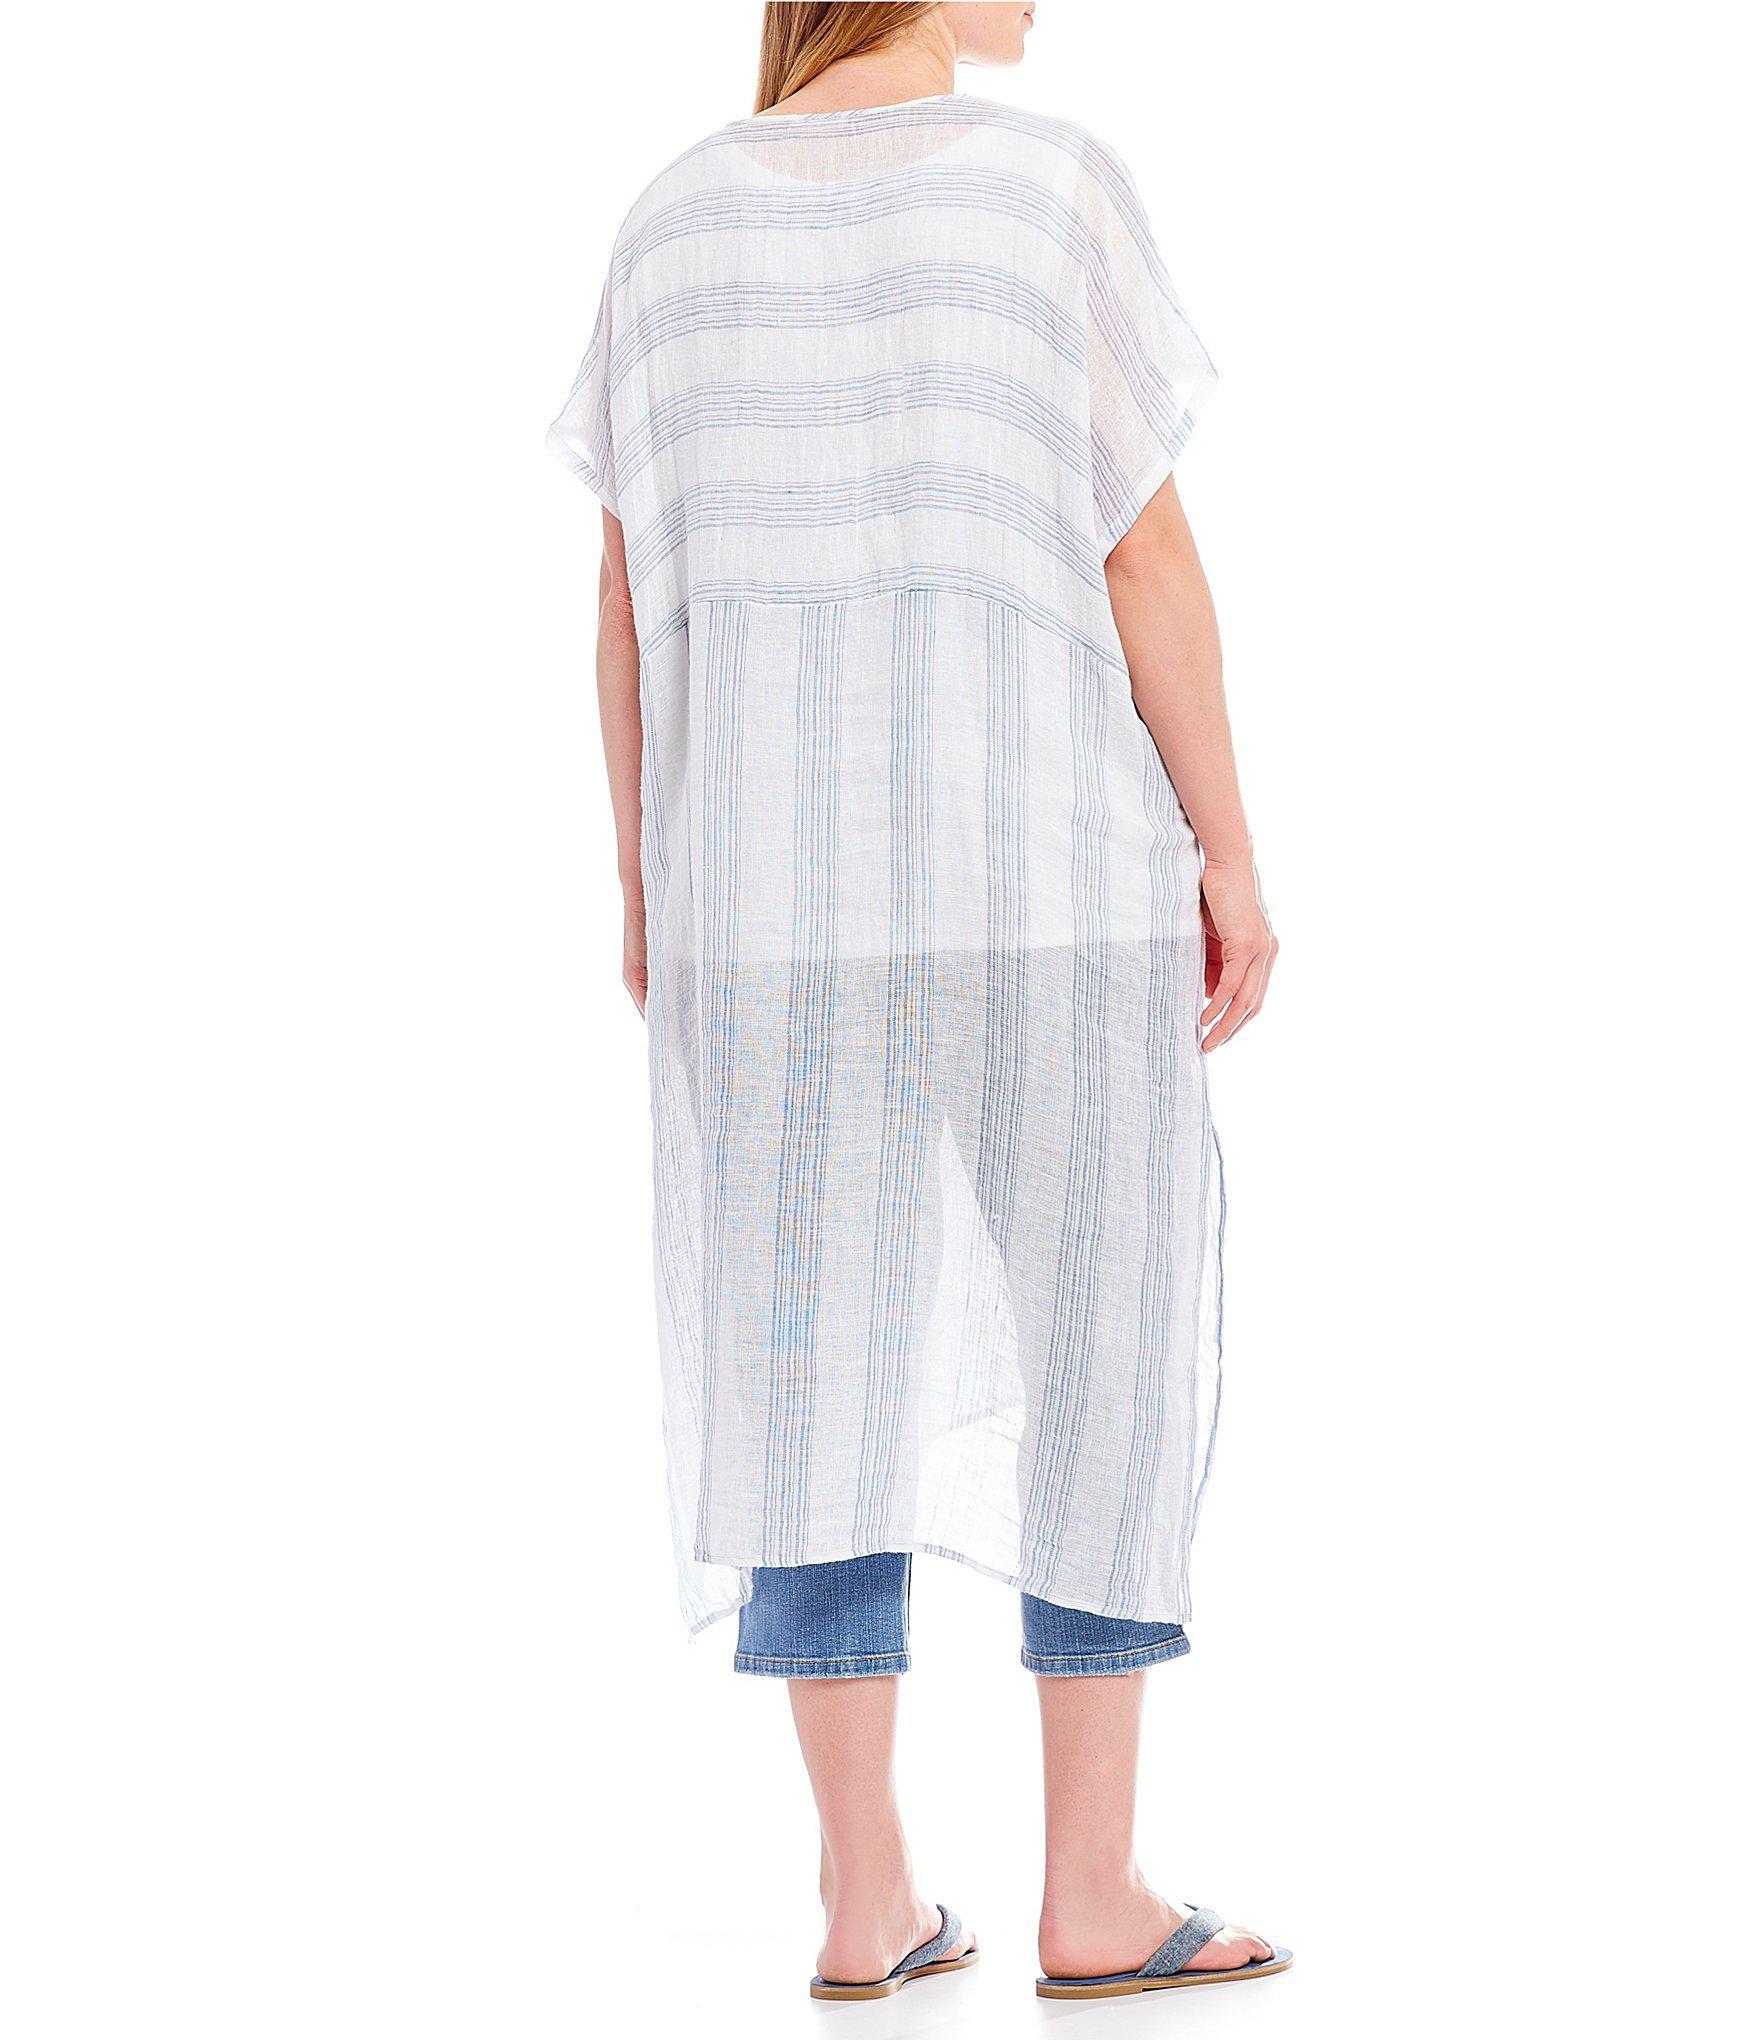 19ba9078a26 Lyst - Eileen Fisher Plus Size V-neck Short Sleeve Stripe Tunic ...